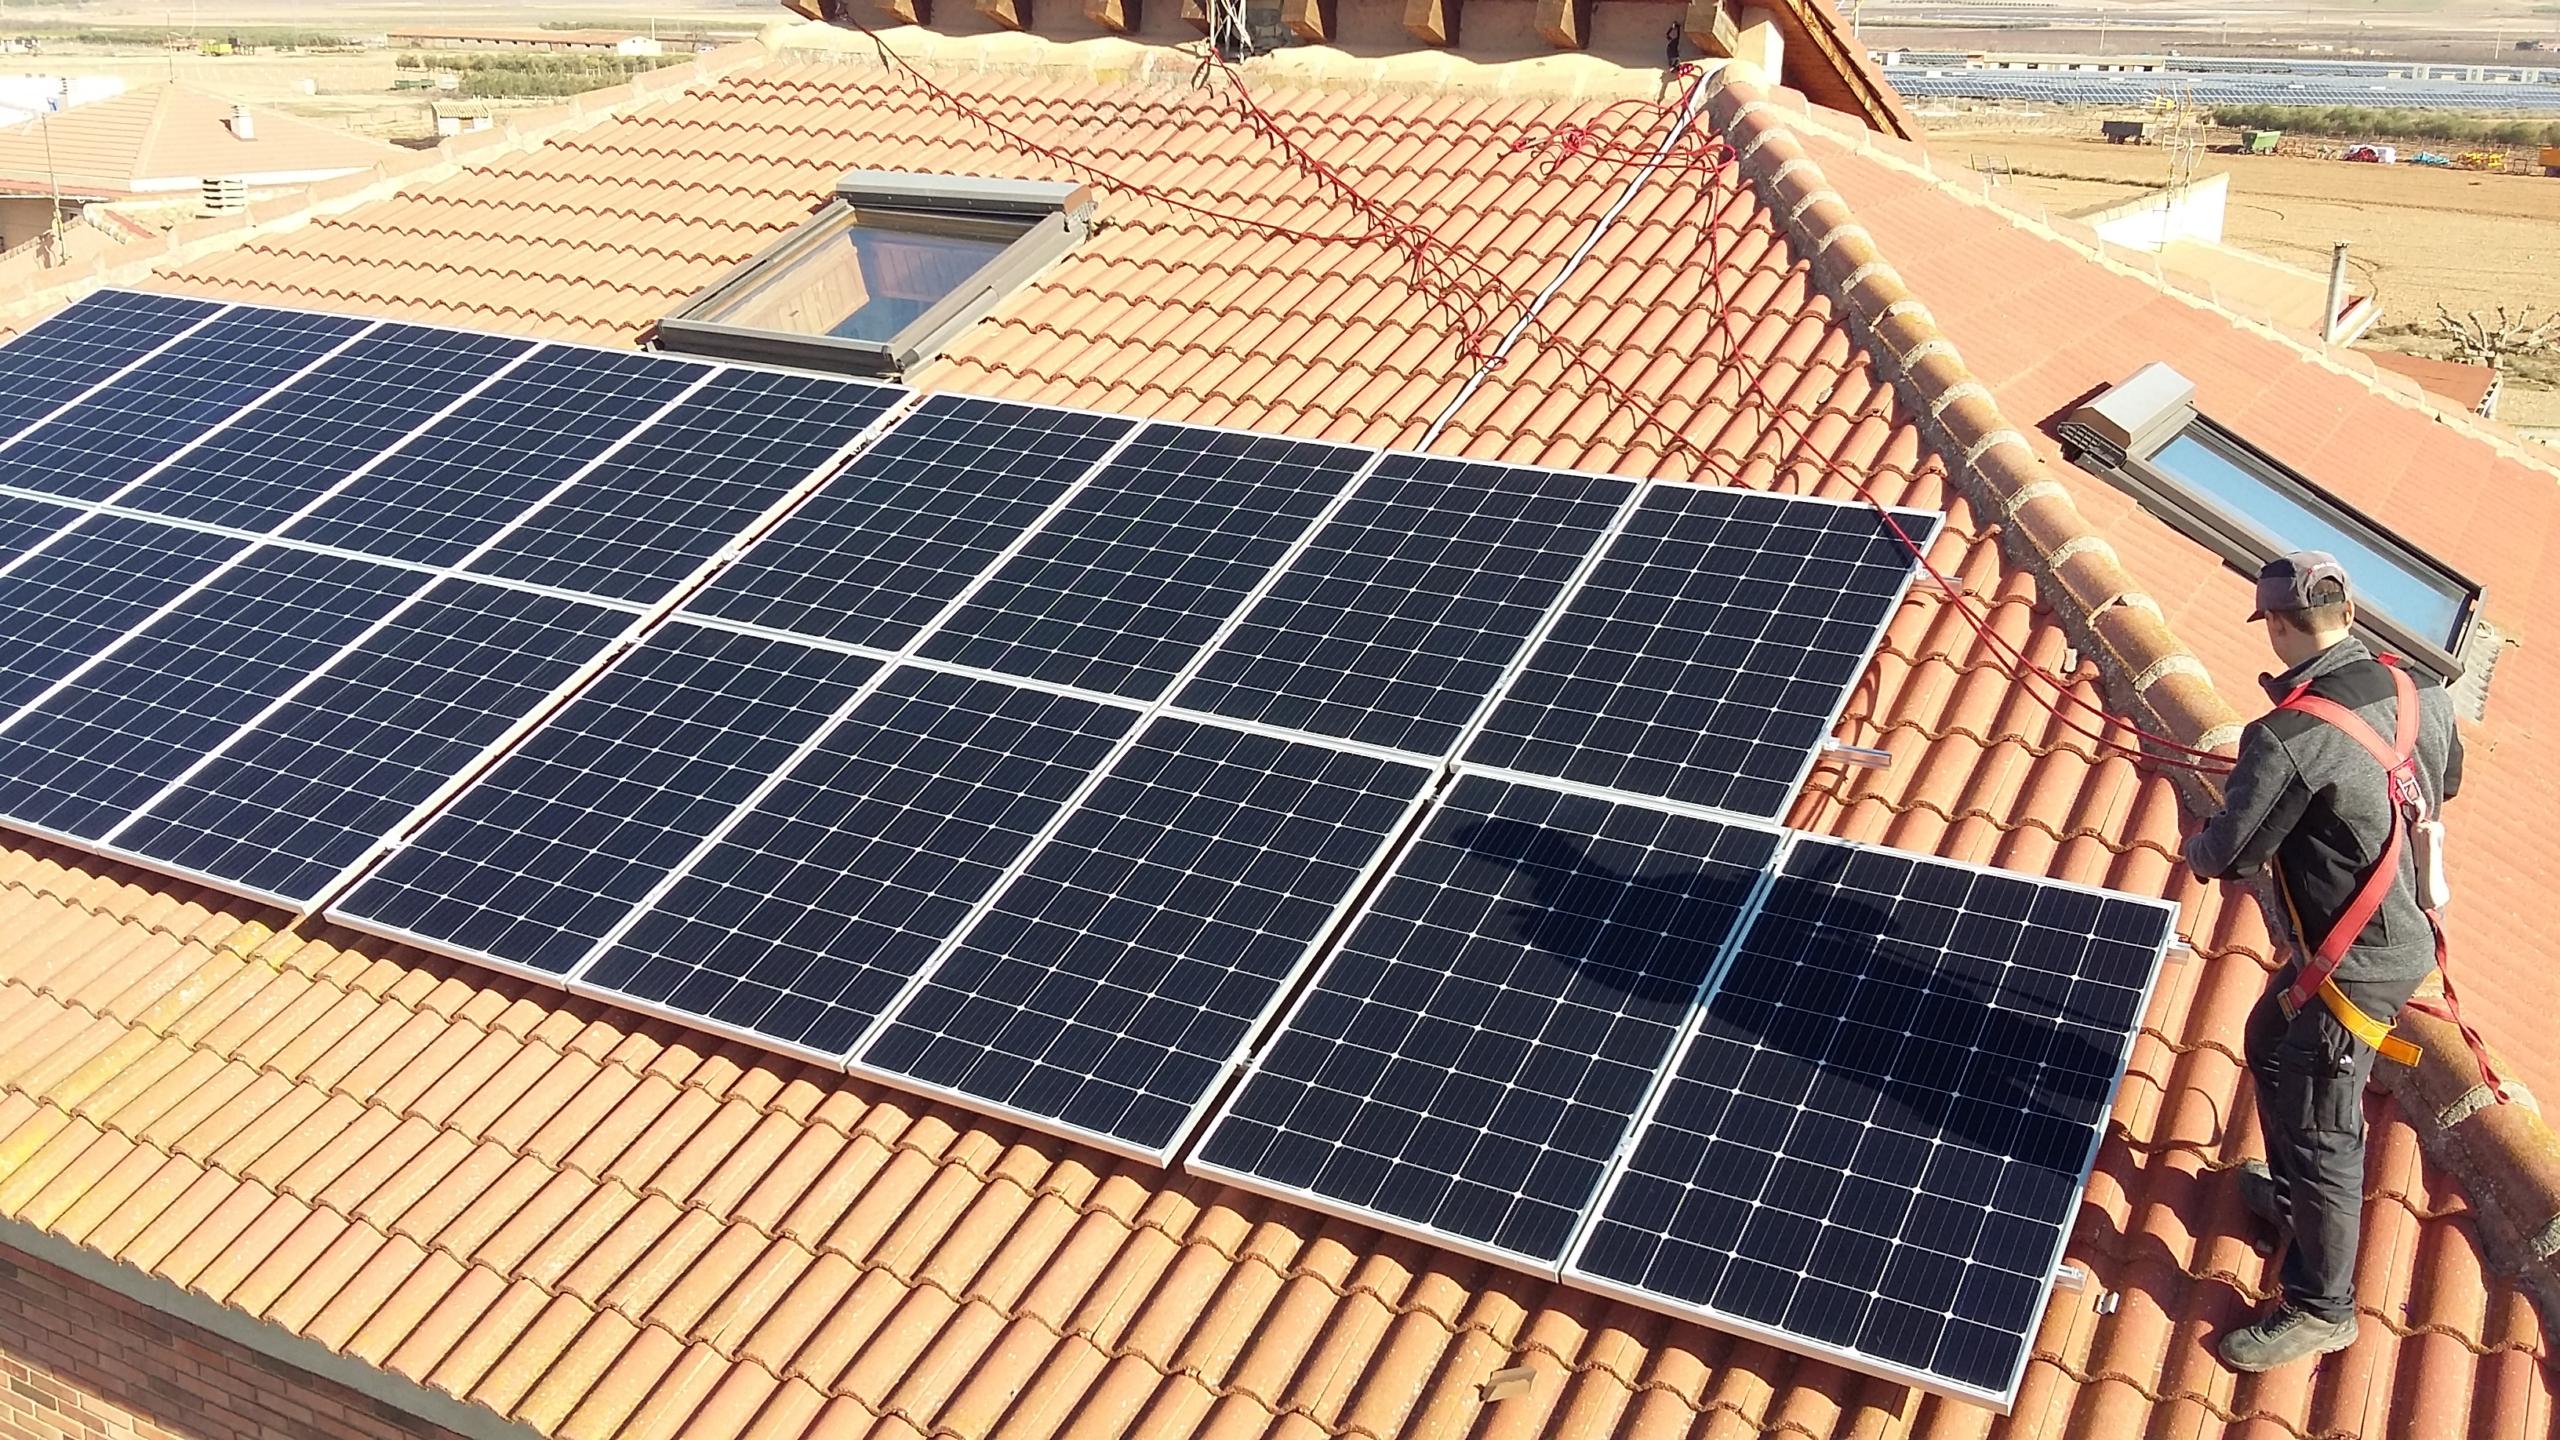 Montaje paneles fotovoltaicos_linea de vida